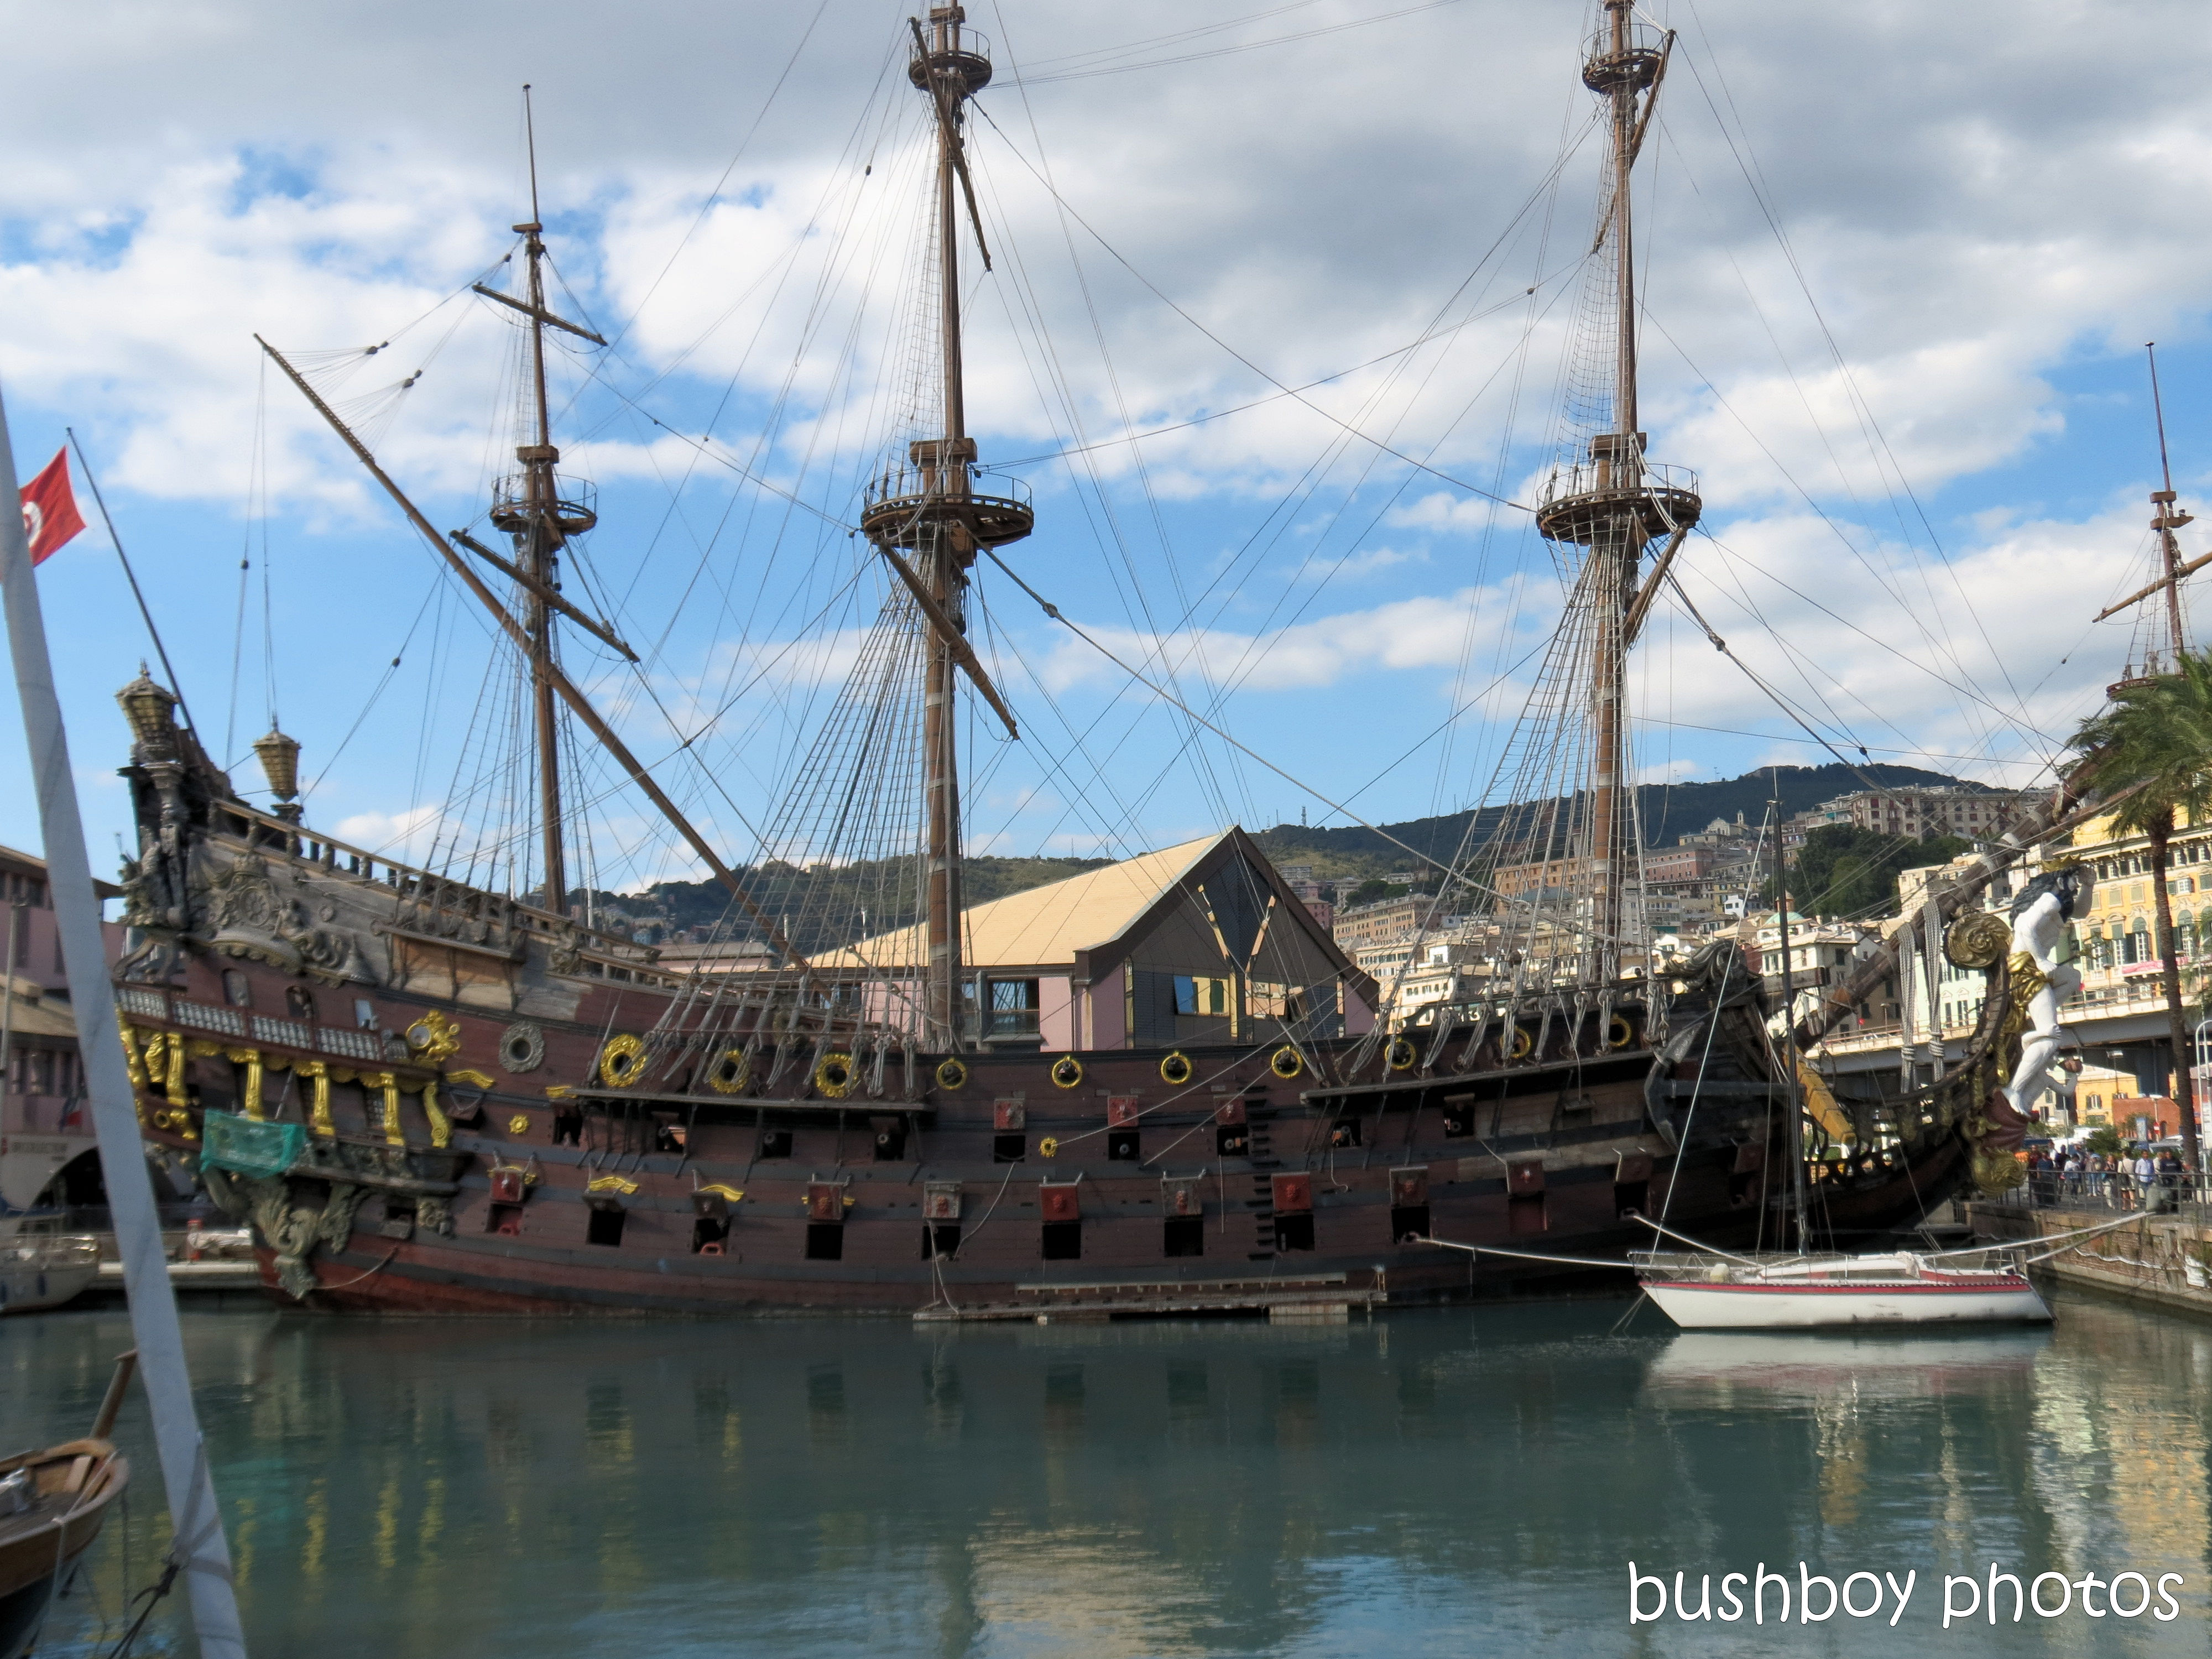 181120_blog challenge_boats_genoa